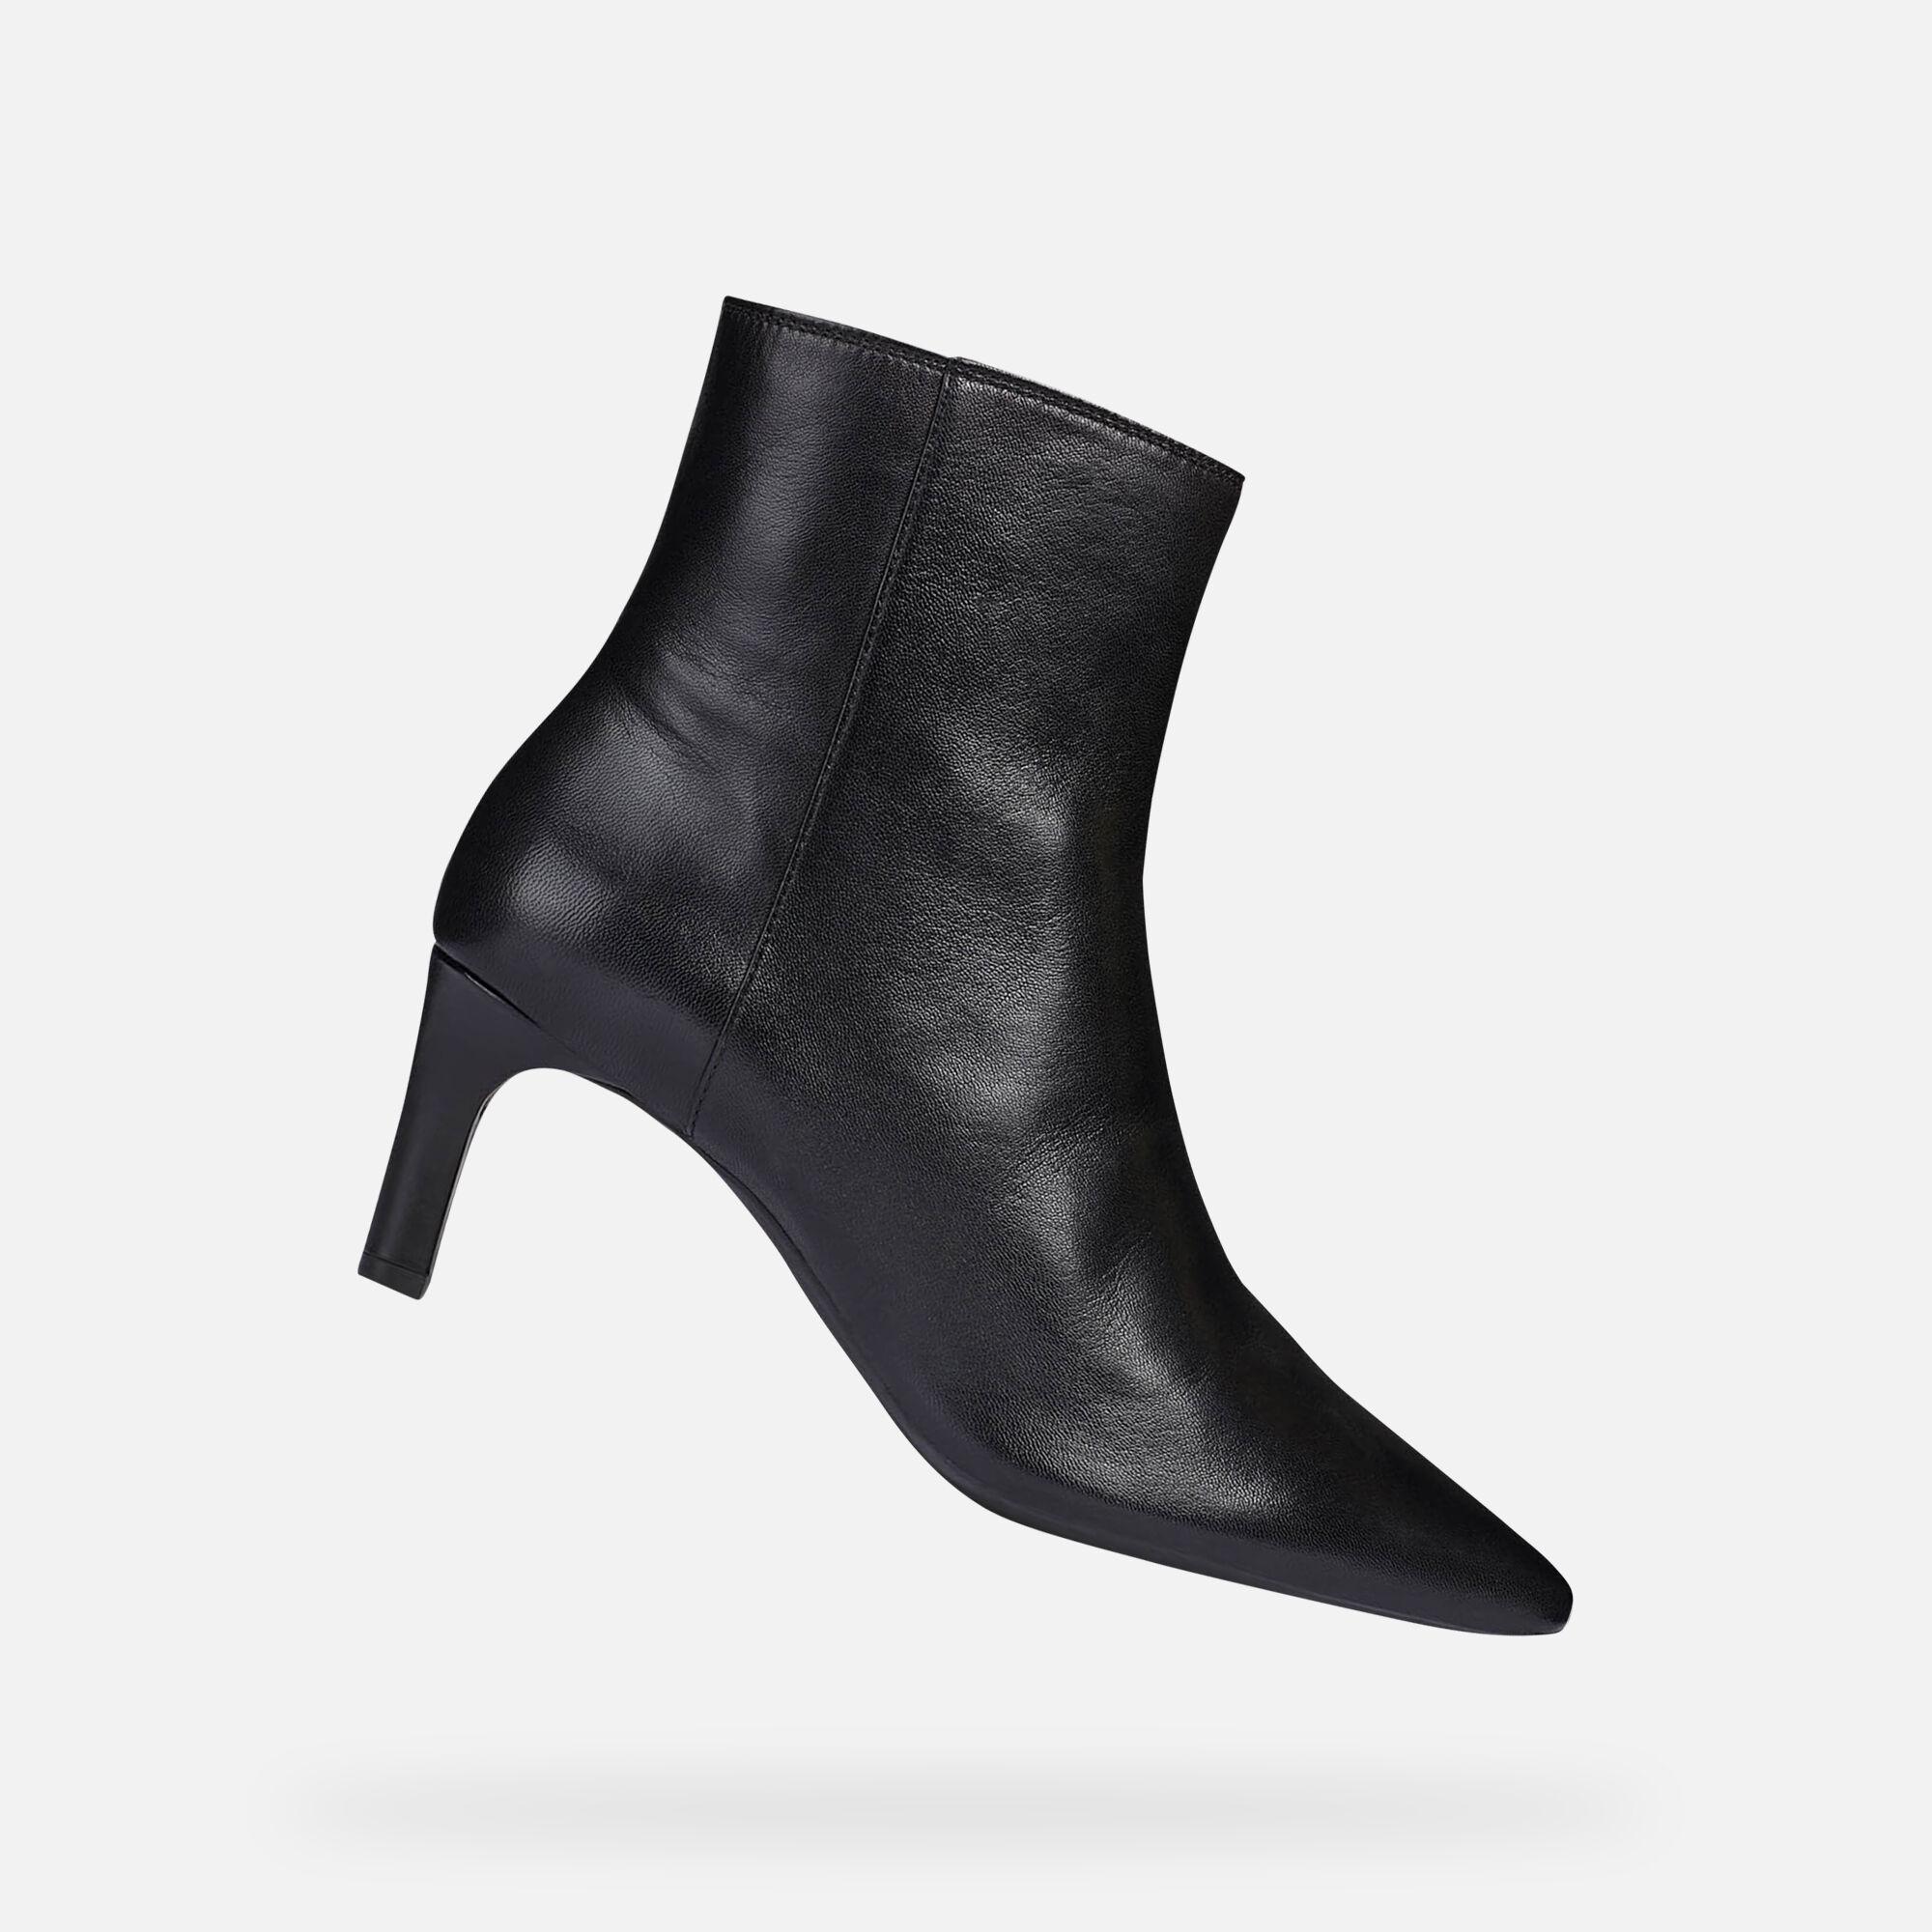 Geox Women's D BIBBIANA Black Ankle Boots | Geox¨ FW 1920